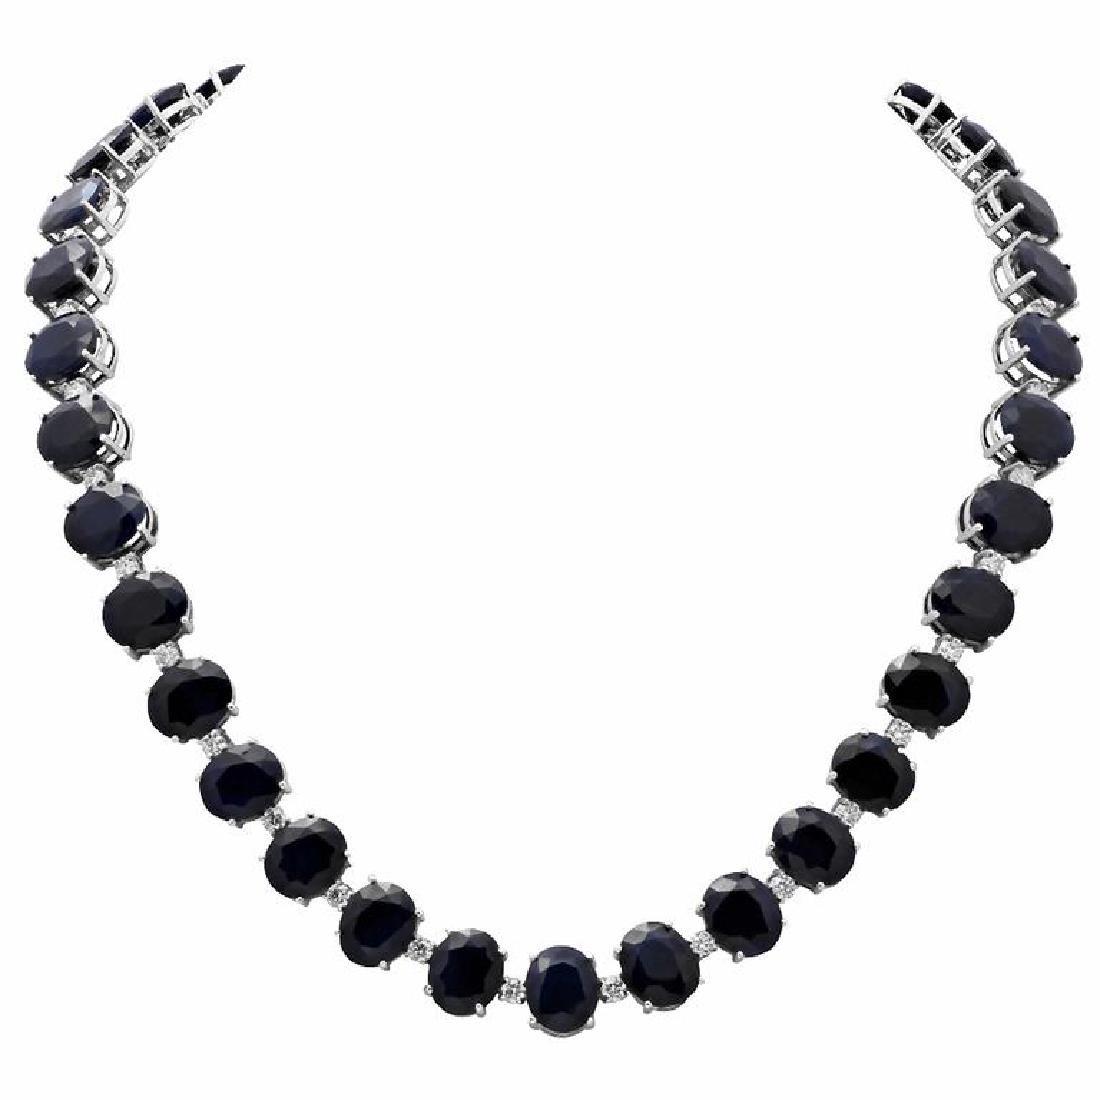 14k White Gold 145.51ct Sapphire 4.31ct Diamond